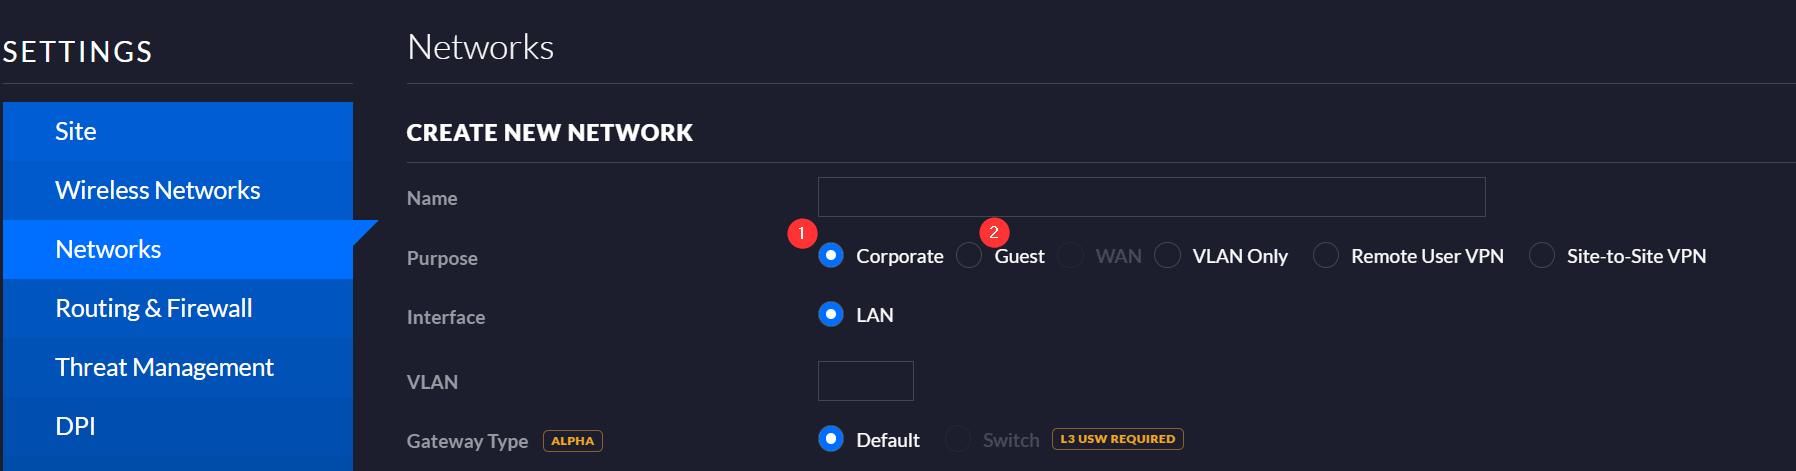 Unifi Network > Settings > Network > Create Network